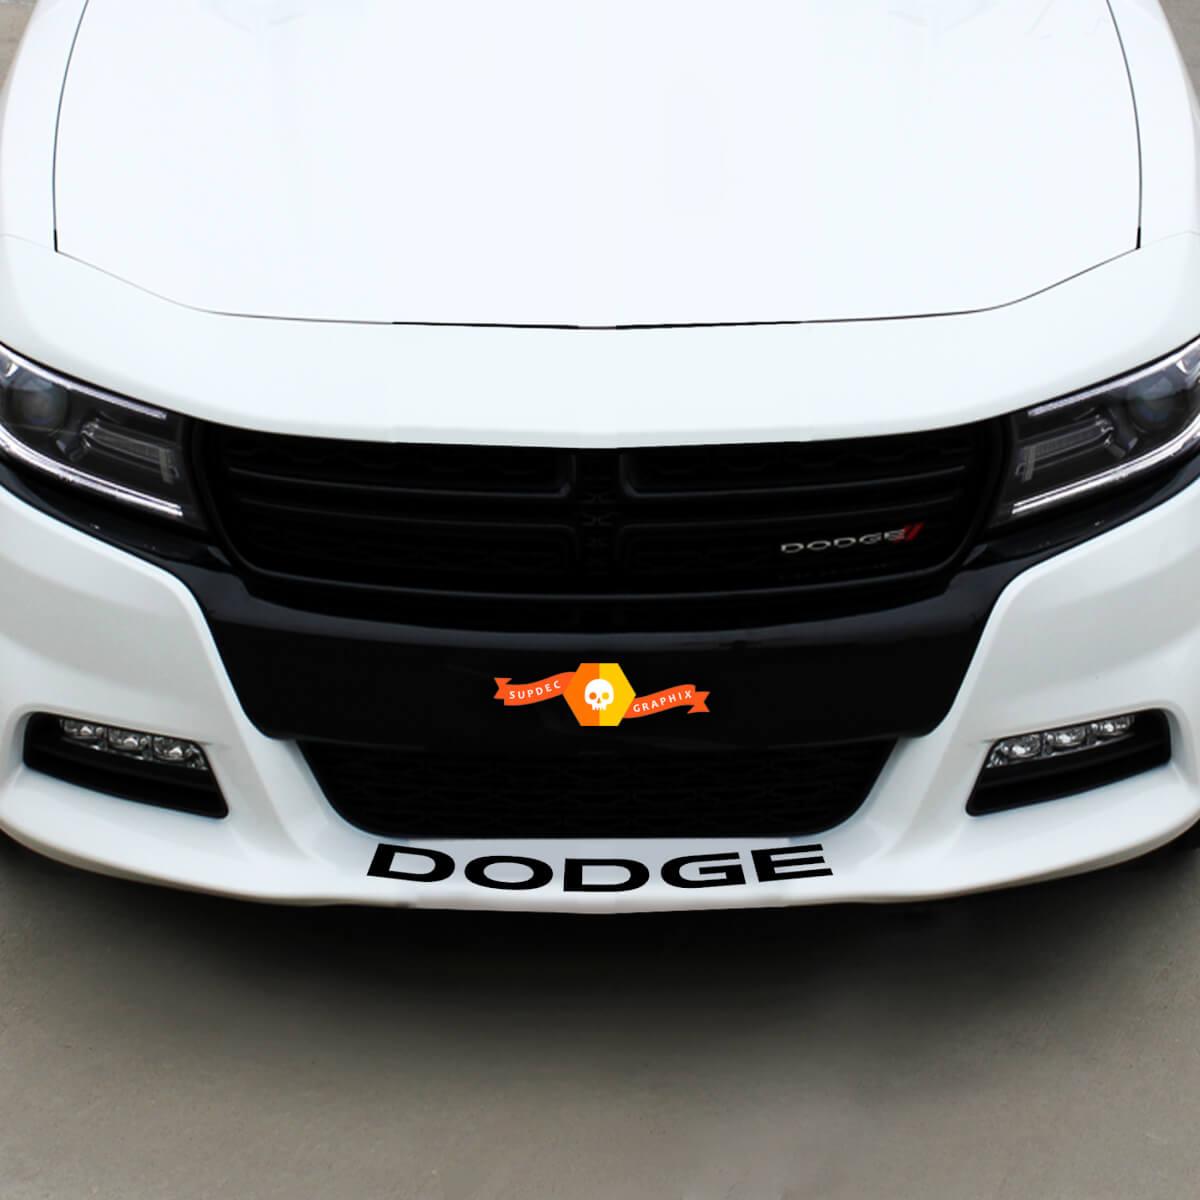 Dodge Front Spoiler Decal Sticker Grafik passt zu allen Modellen